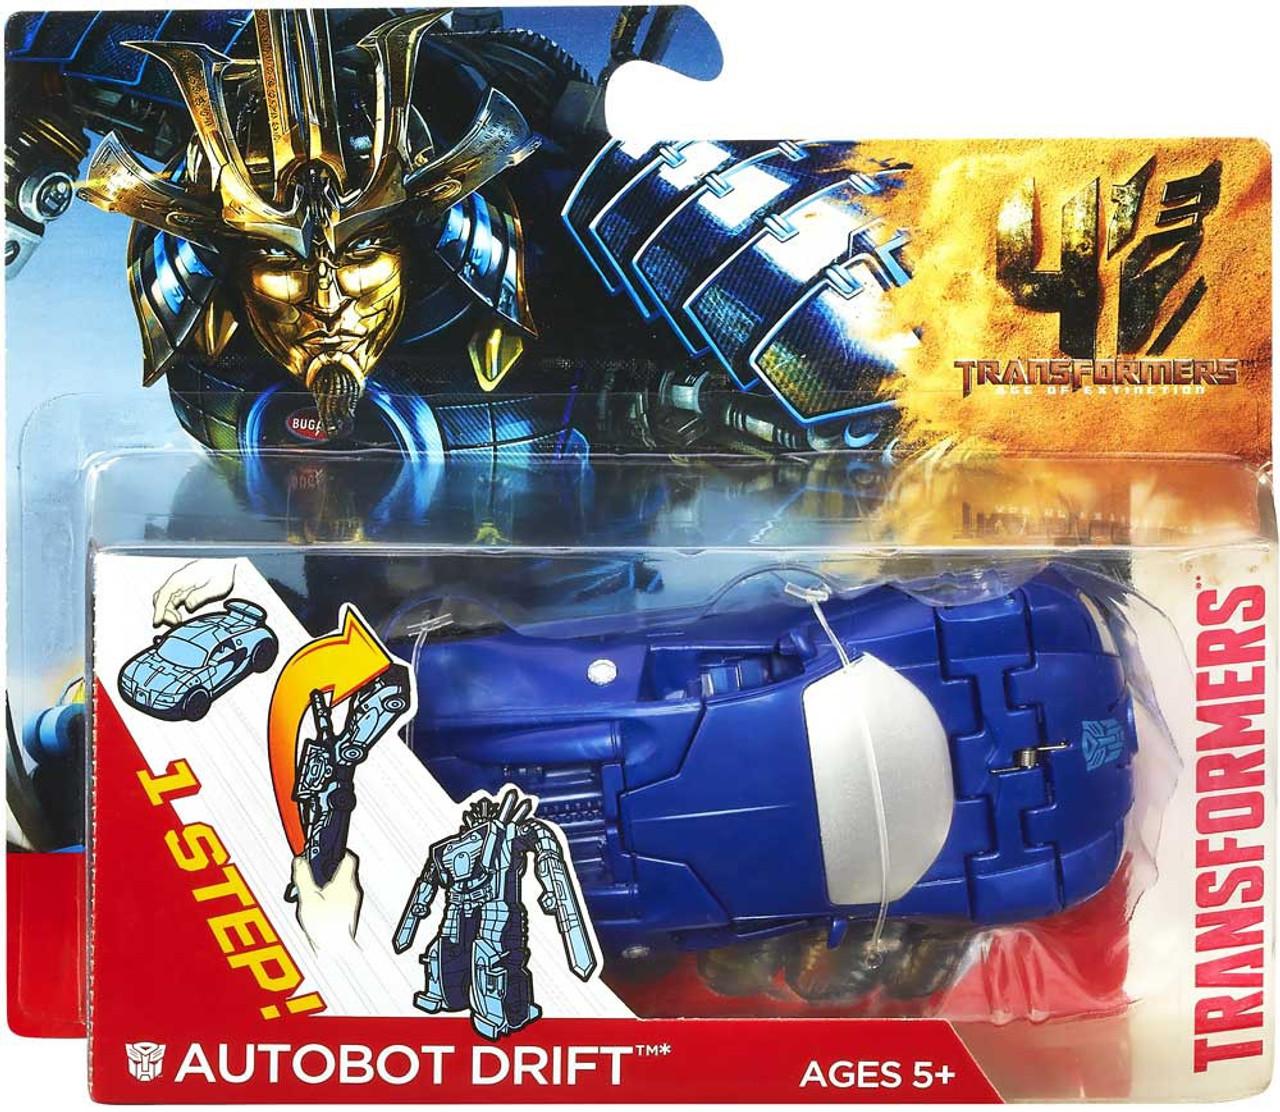 Transformers Age of Extinction 1 Step Changer Autobot Drift Car Action Figure